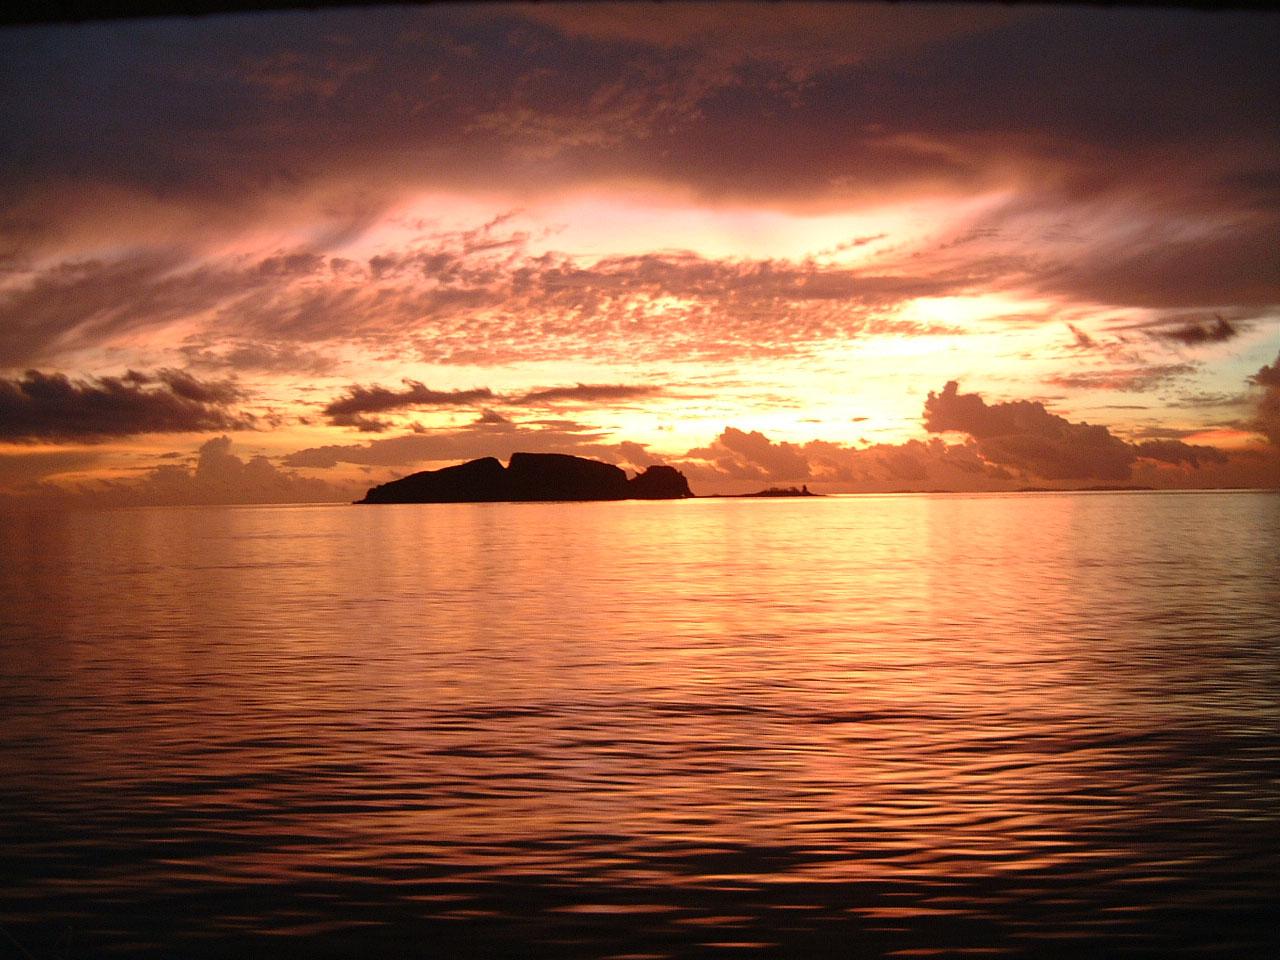 Sunset Philippines Club Paradise 01